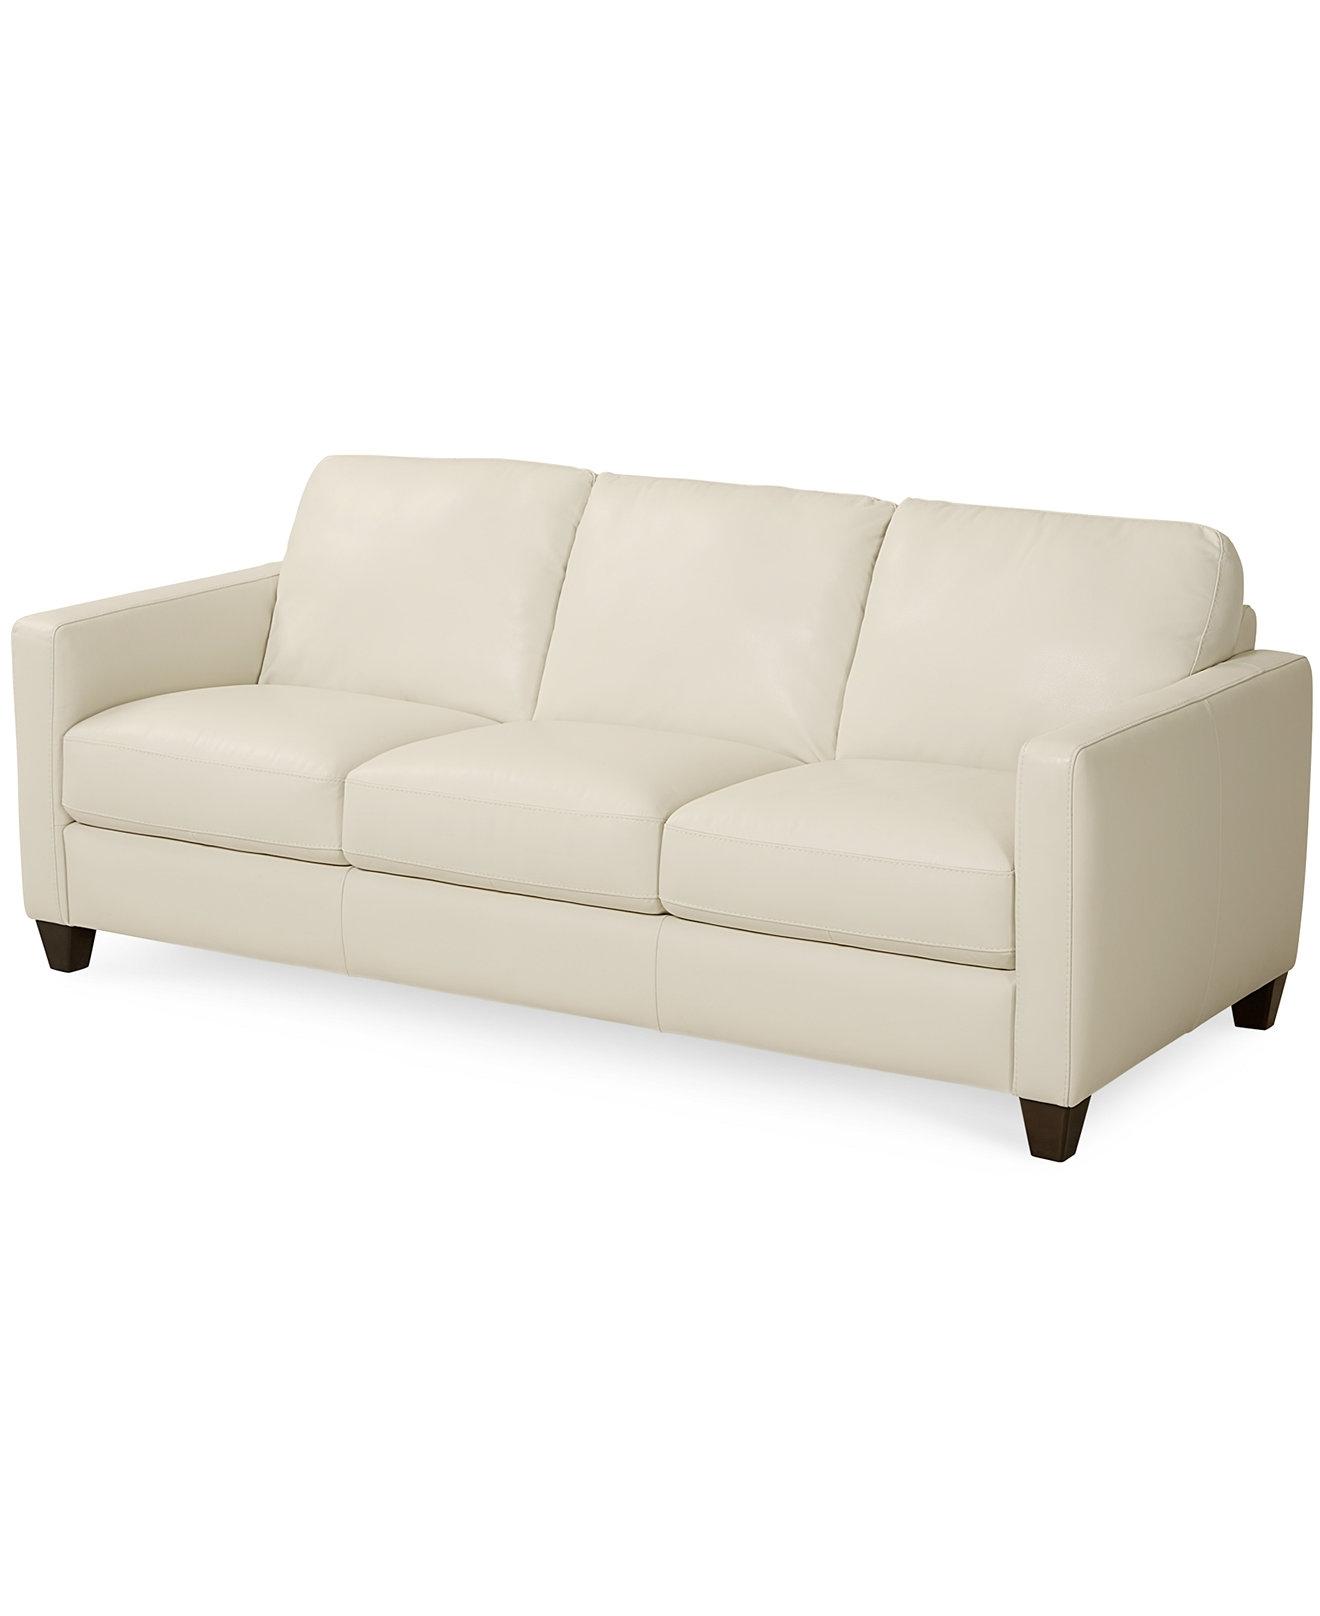 Macys Leather Sofa – Mforum Regarding Well Liked Macys Leather Sofas (View 9 of 20)